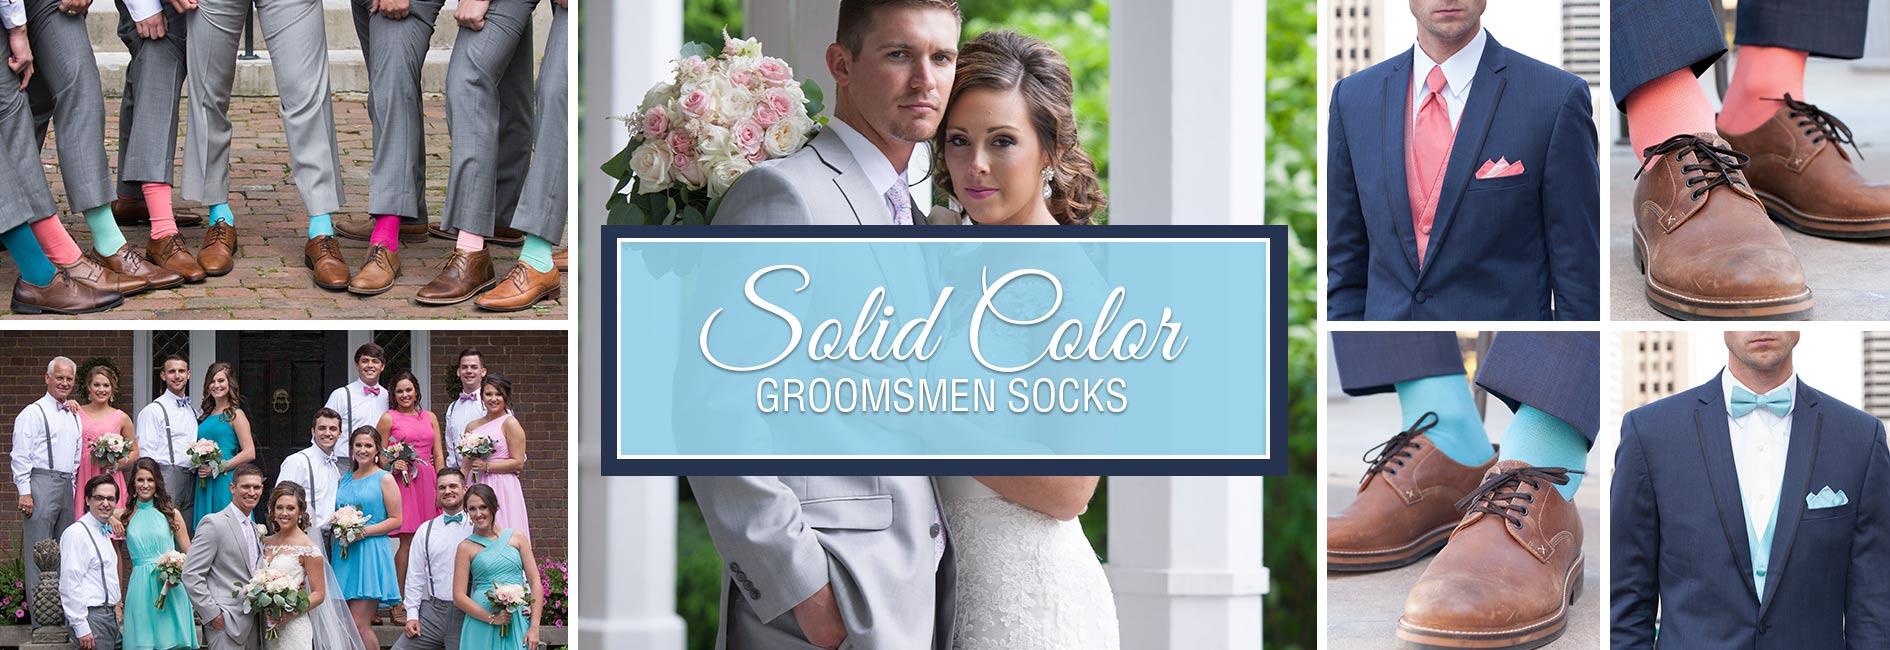 Solid Color Groomsmen Wedding Socks Banner